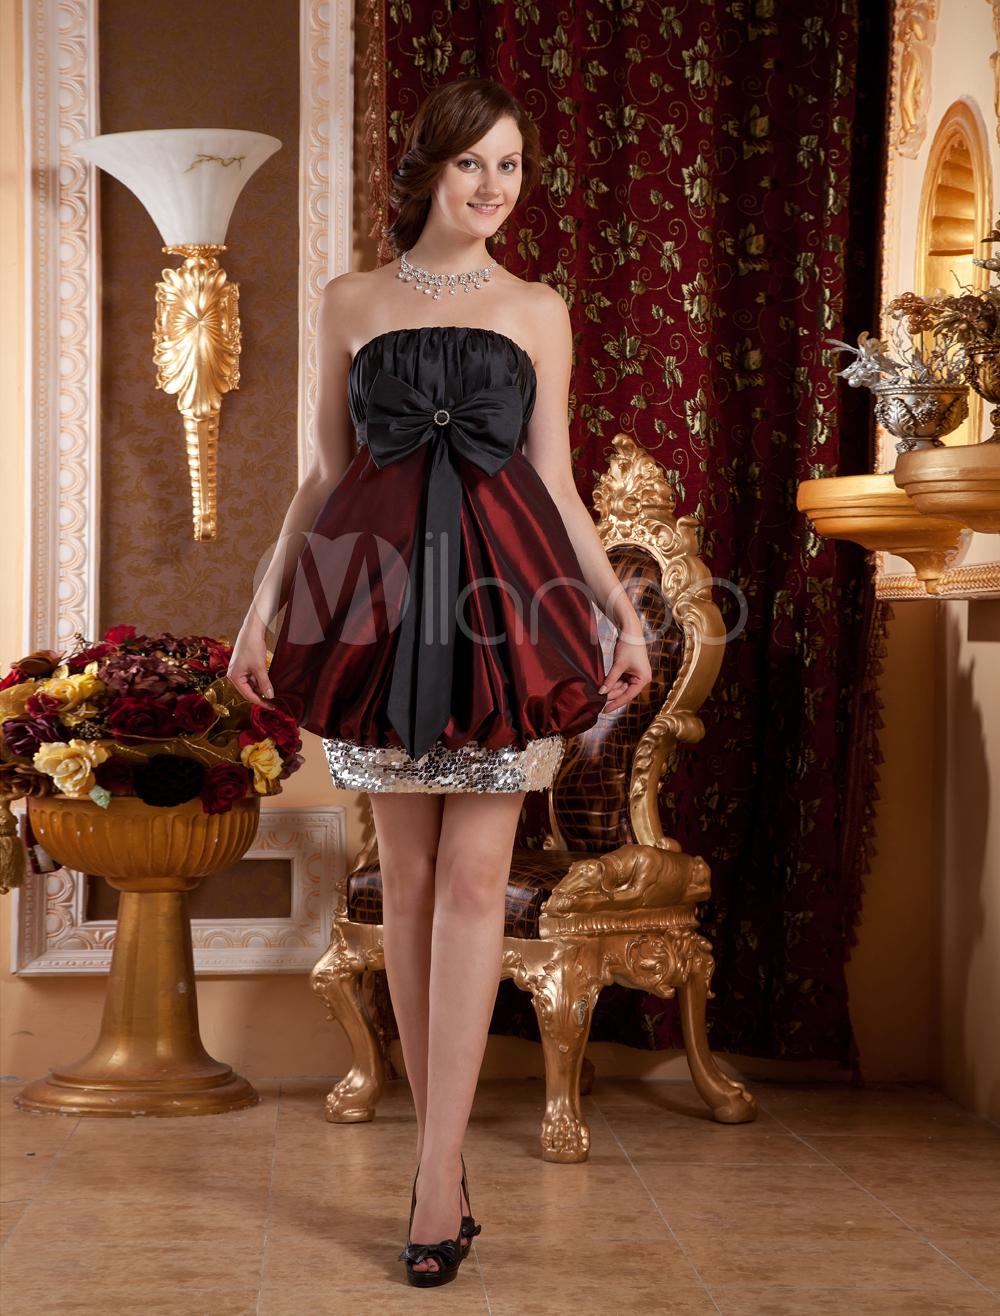 Burgundy Sheath Strapless Bow Charmeuse Cocktail Dress (Wedding Cheap Party Dress) photo